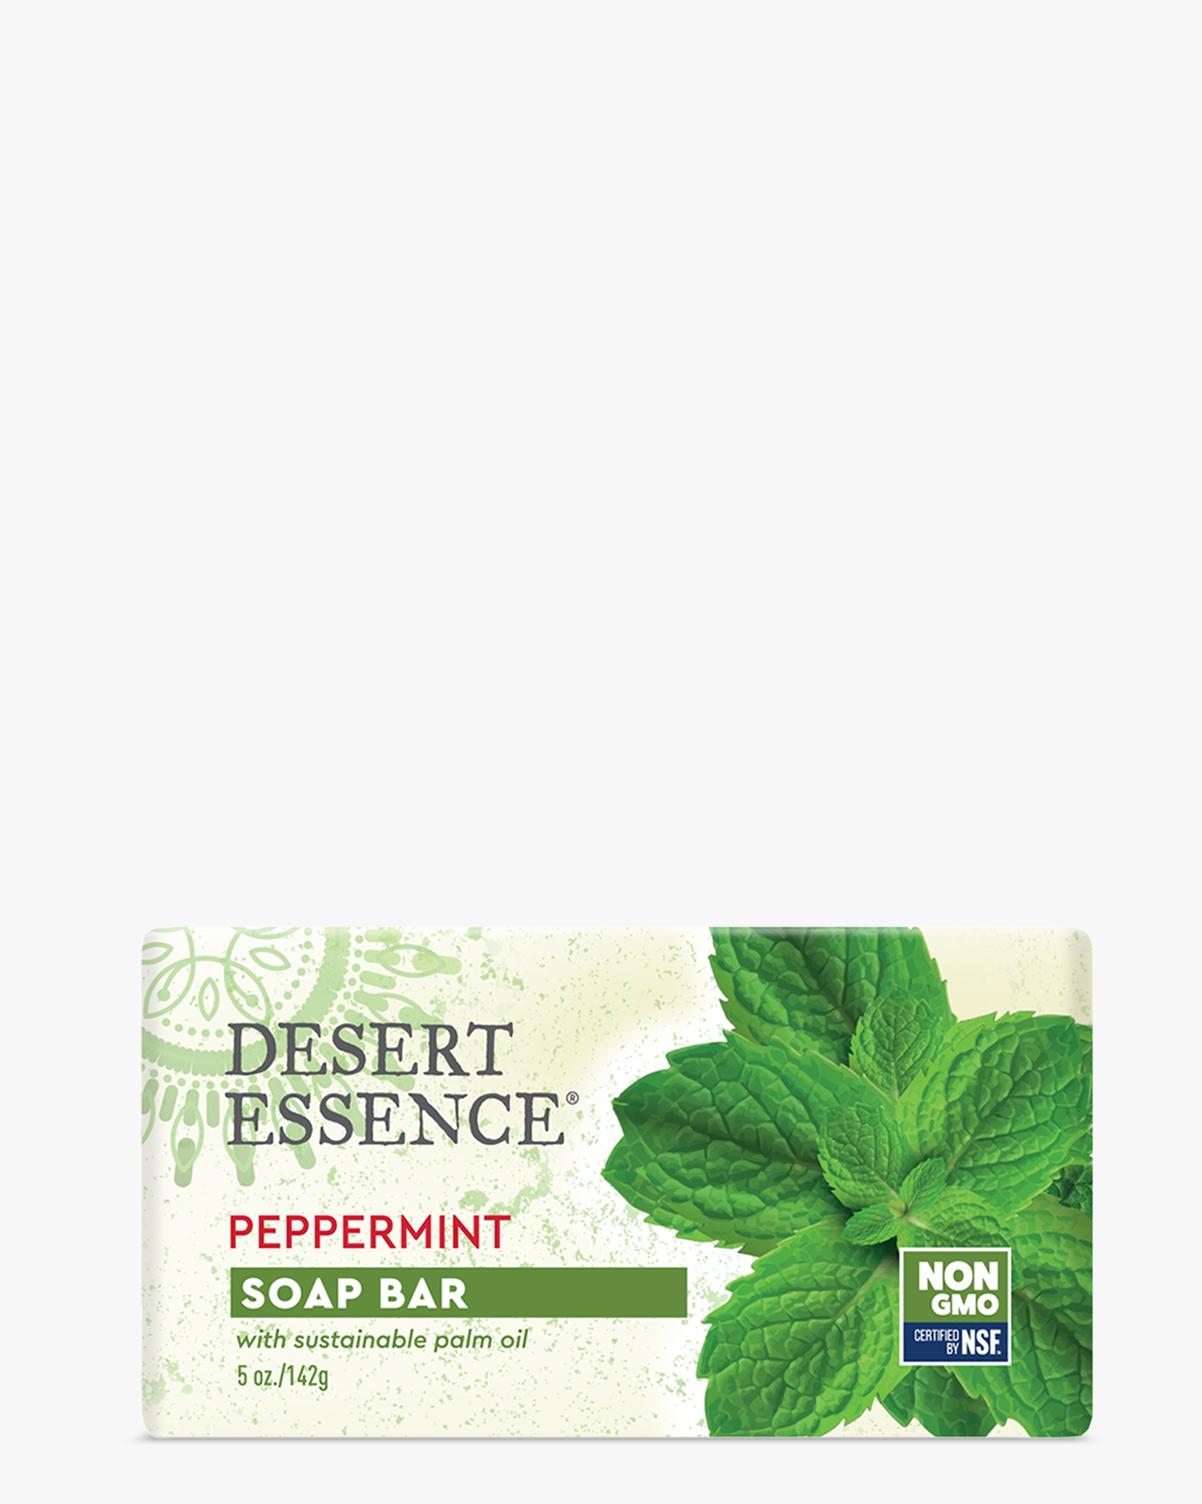 Desert Essence coupon: Desert Essence Peppermint Soap Bar, 5 oz. | Vegan | Gluten-Free